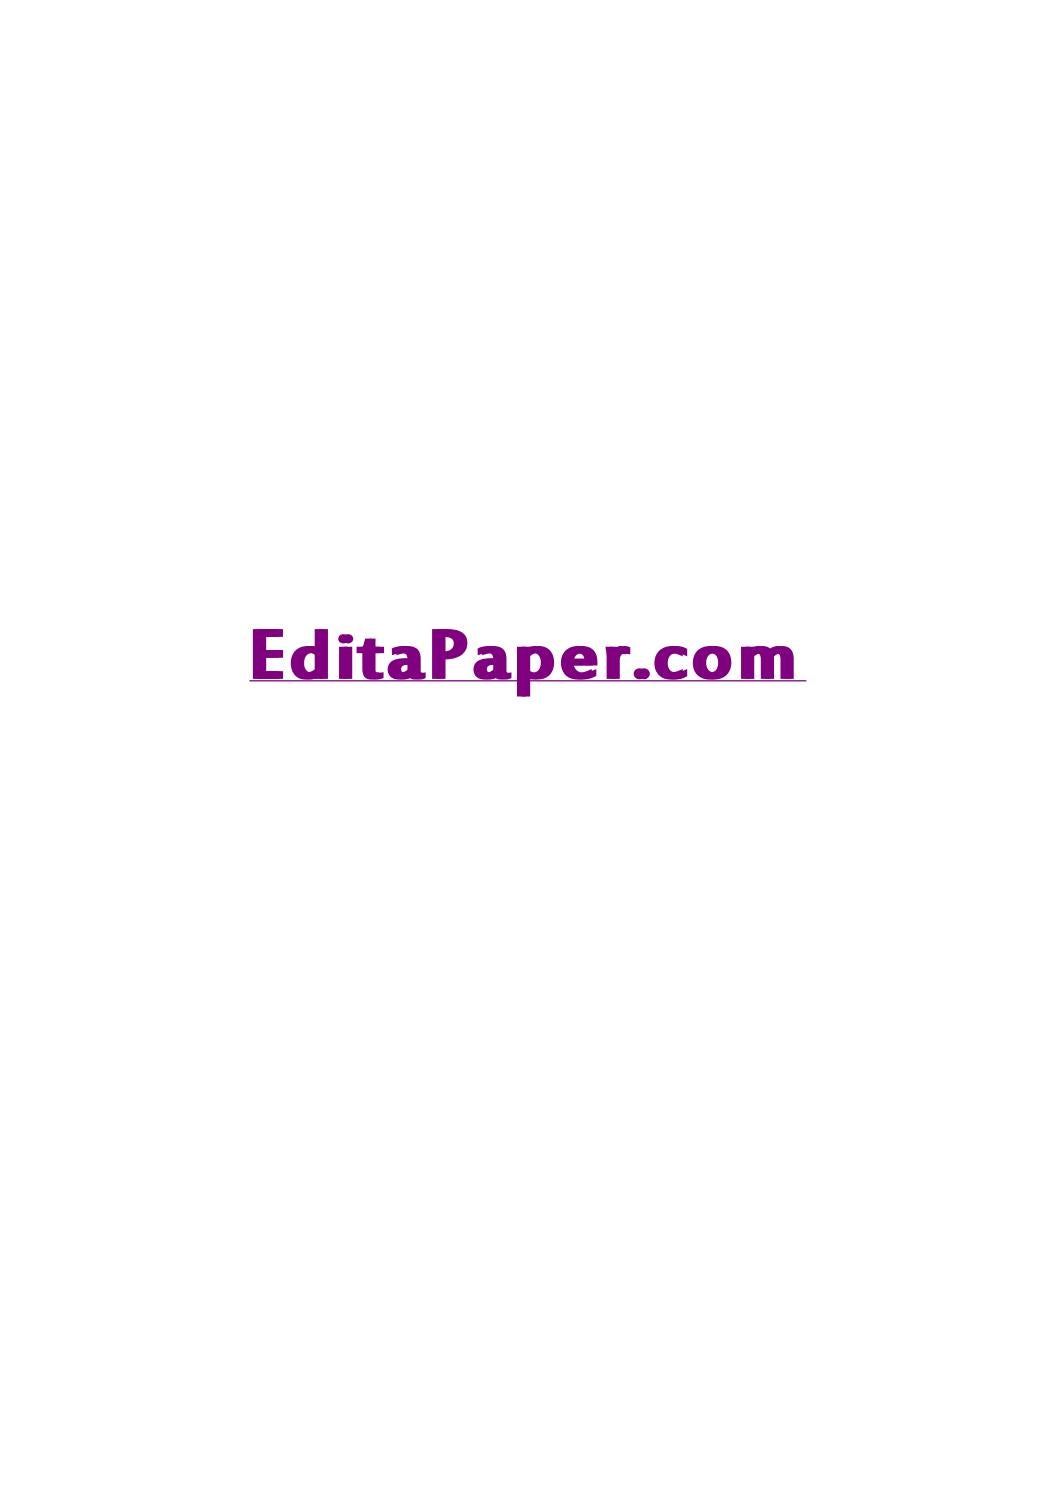 Proofreading service uitm